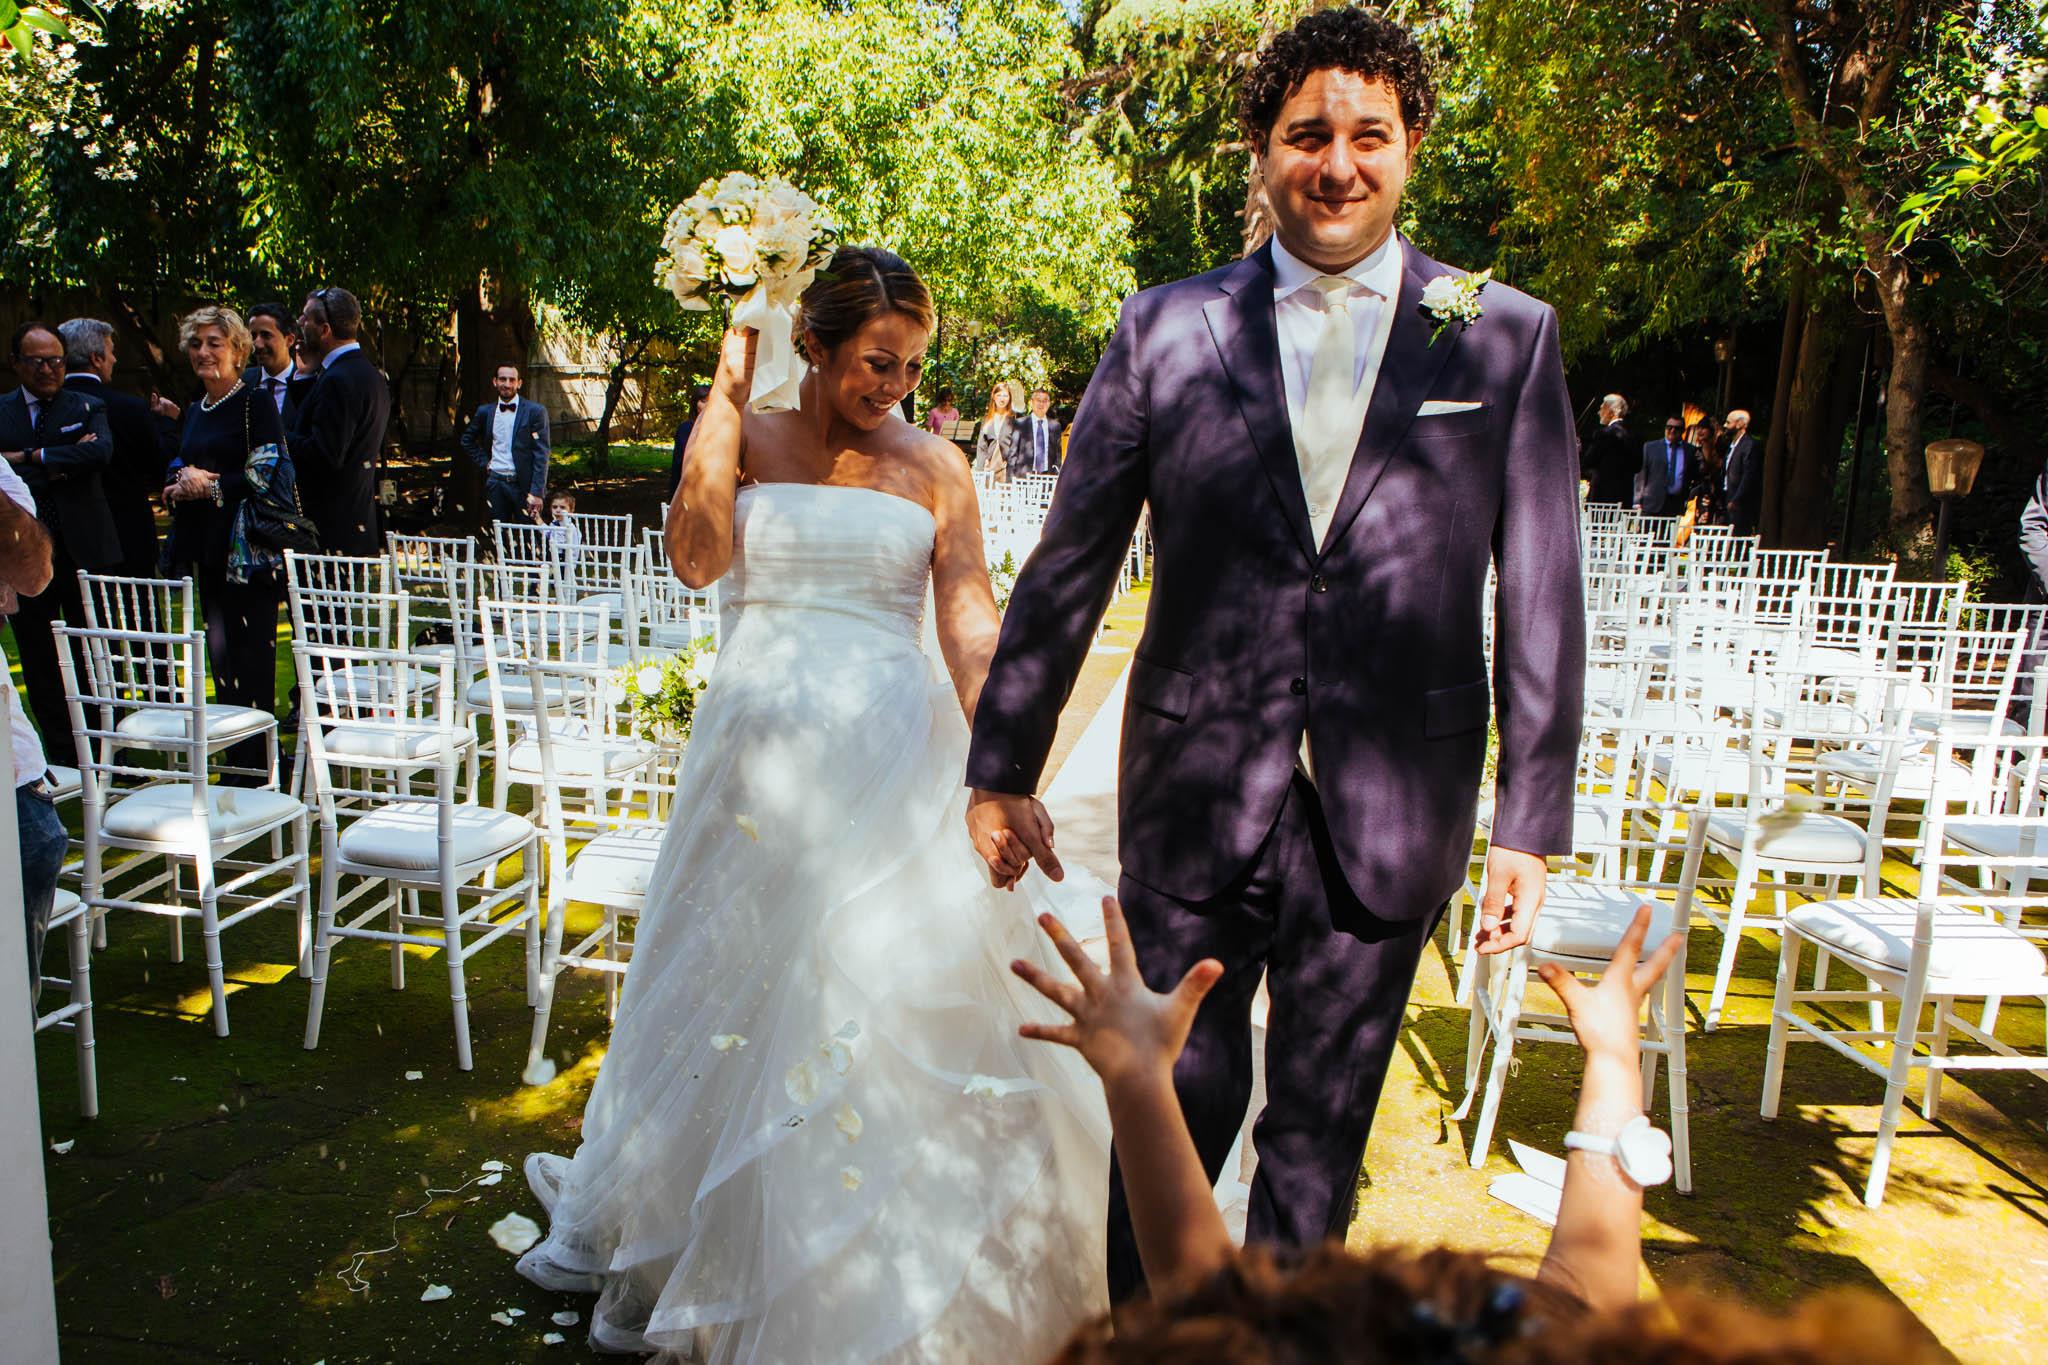 matrimonio-a-catania-43.jpg